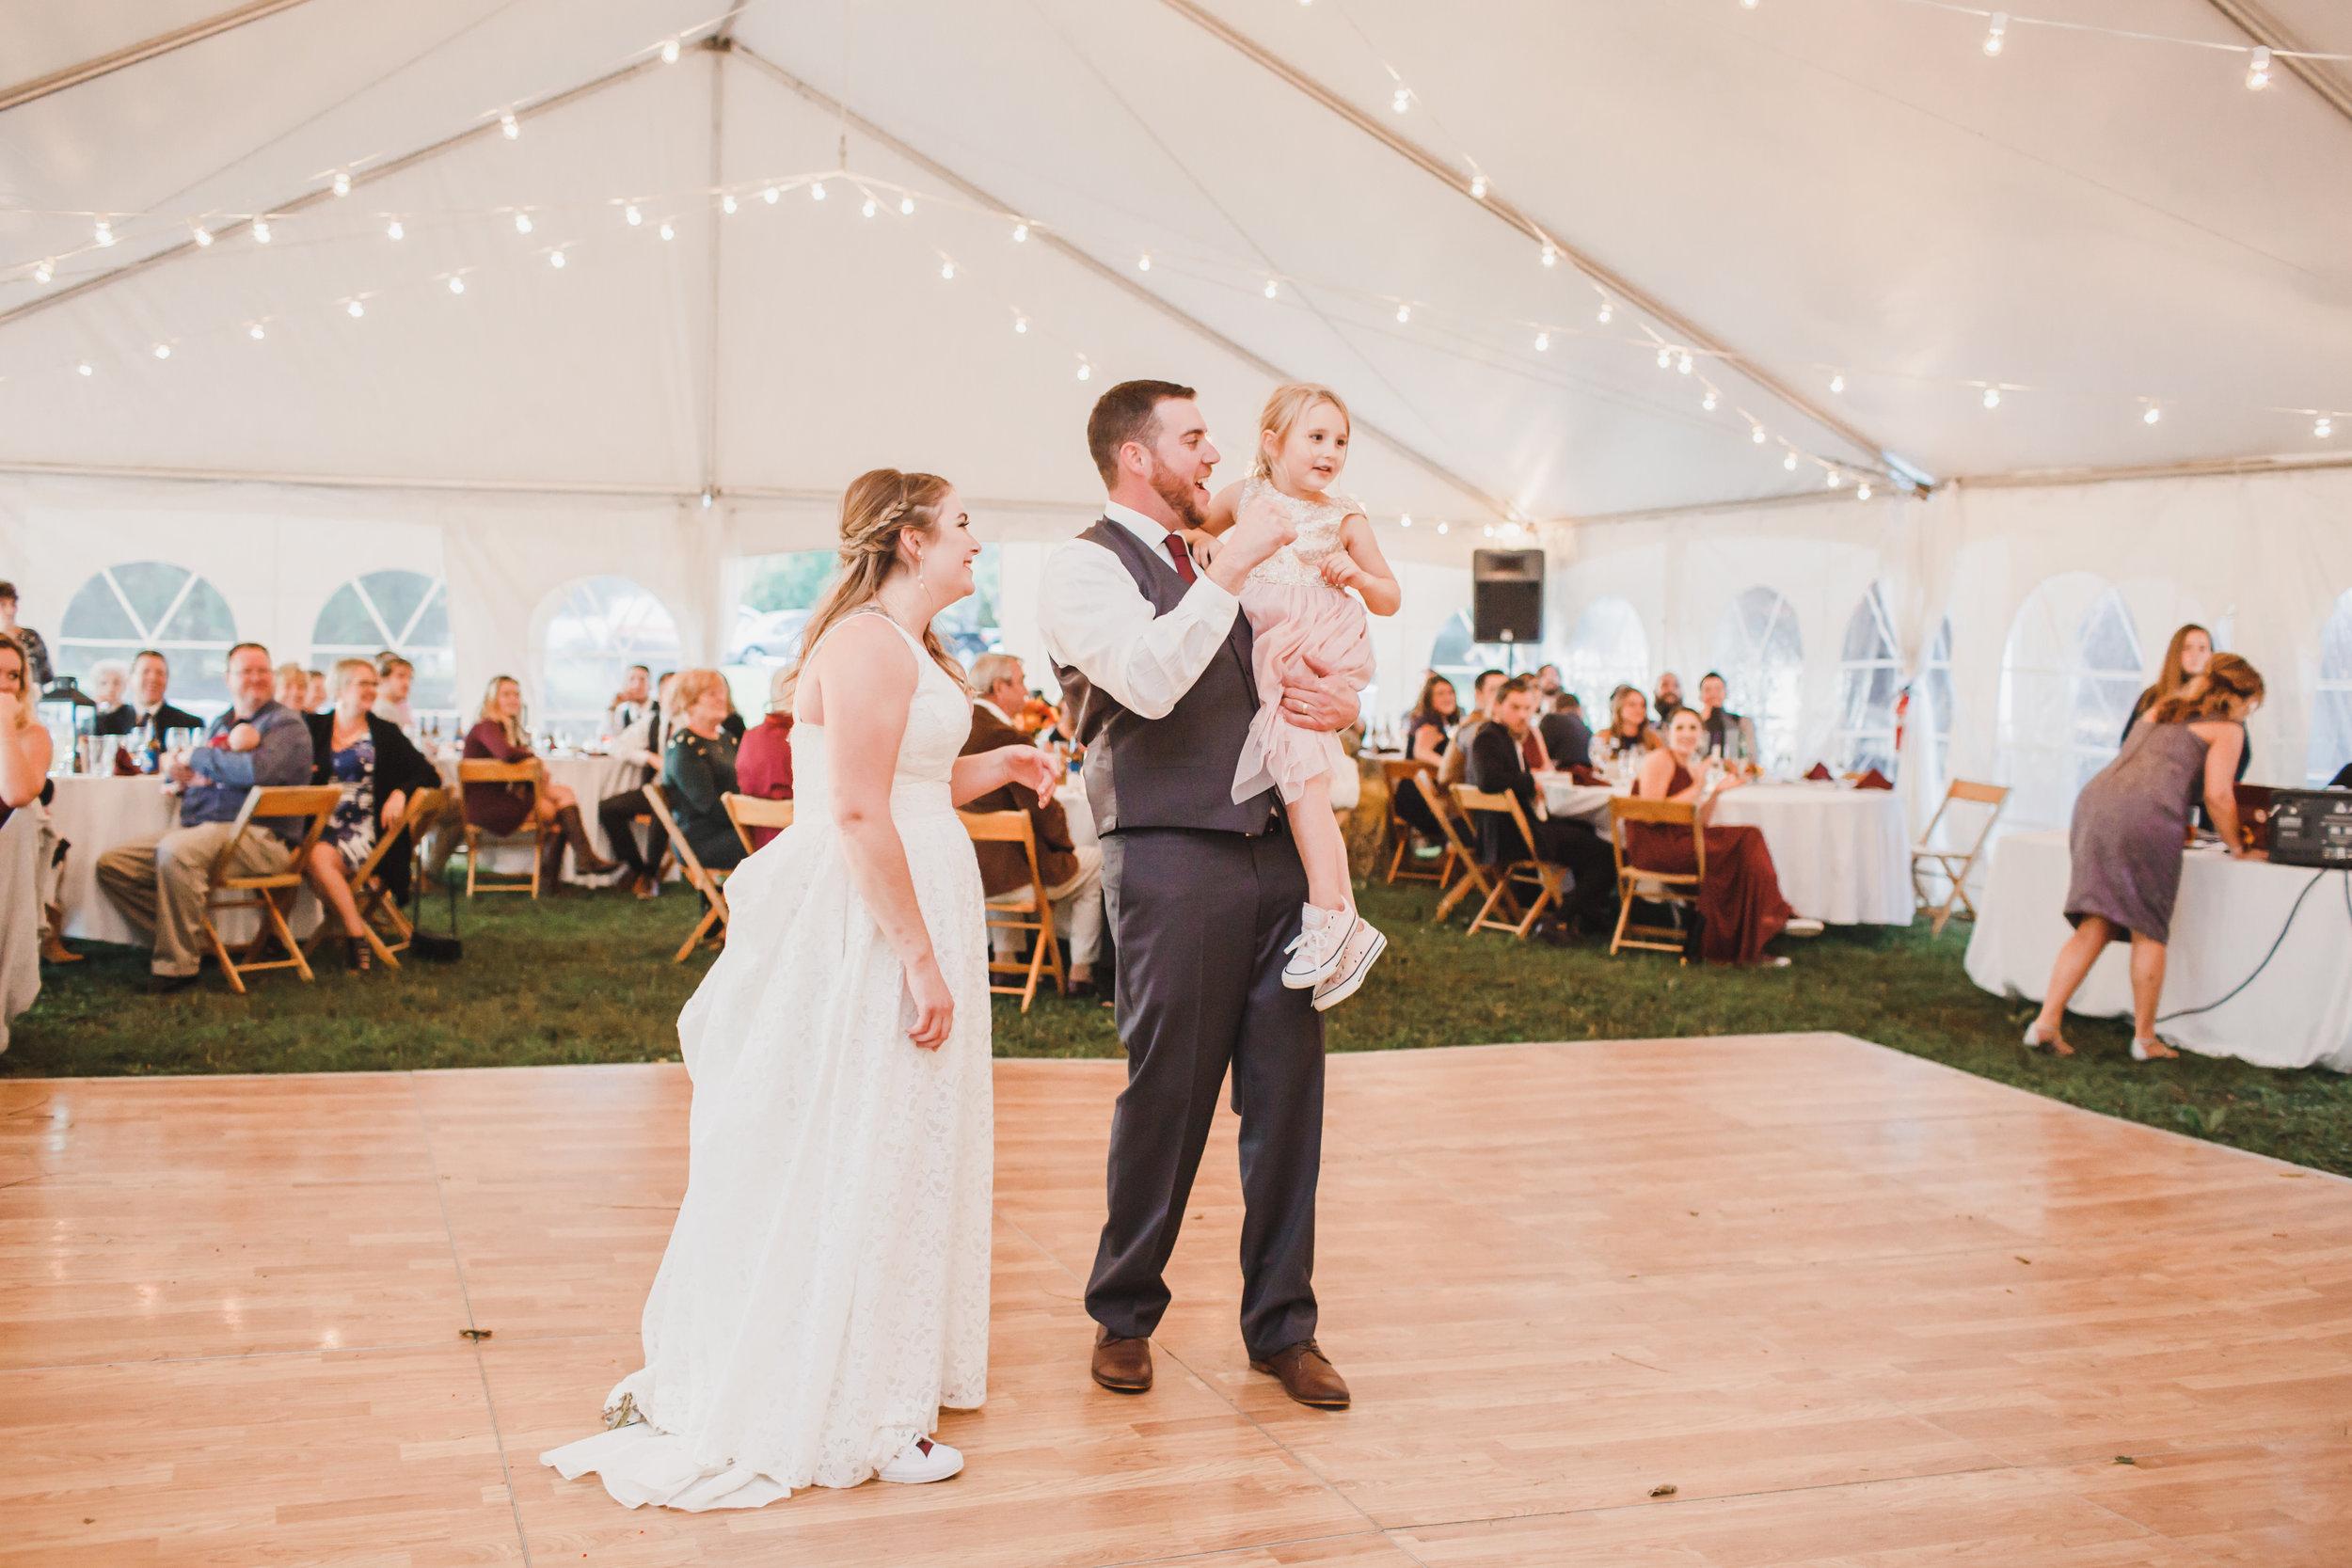 Fling - Virginia Wedding Photographer - Photography by Amy Nicole-4582-6.jpg